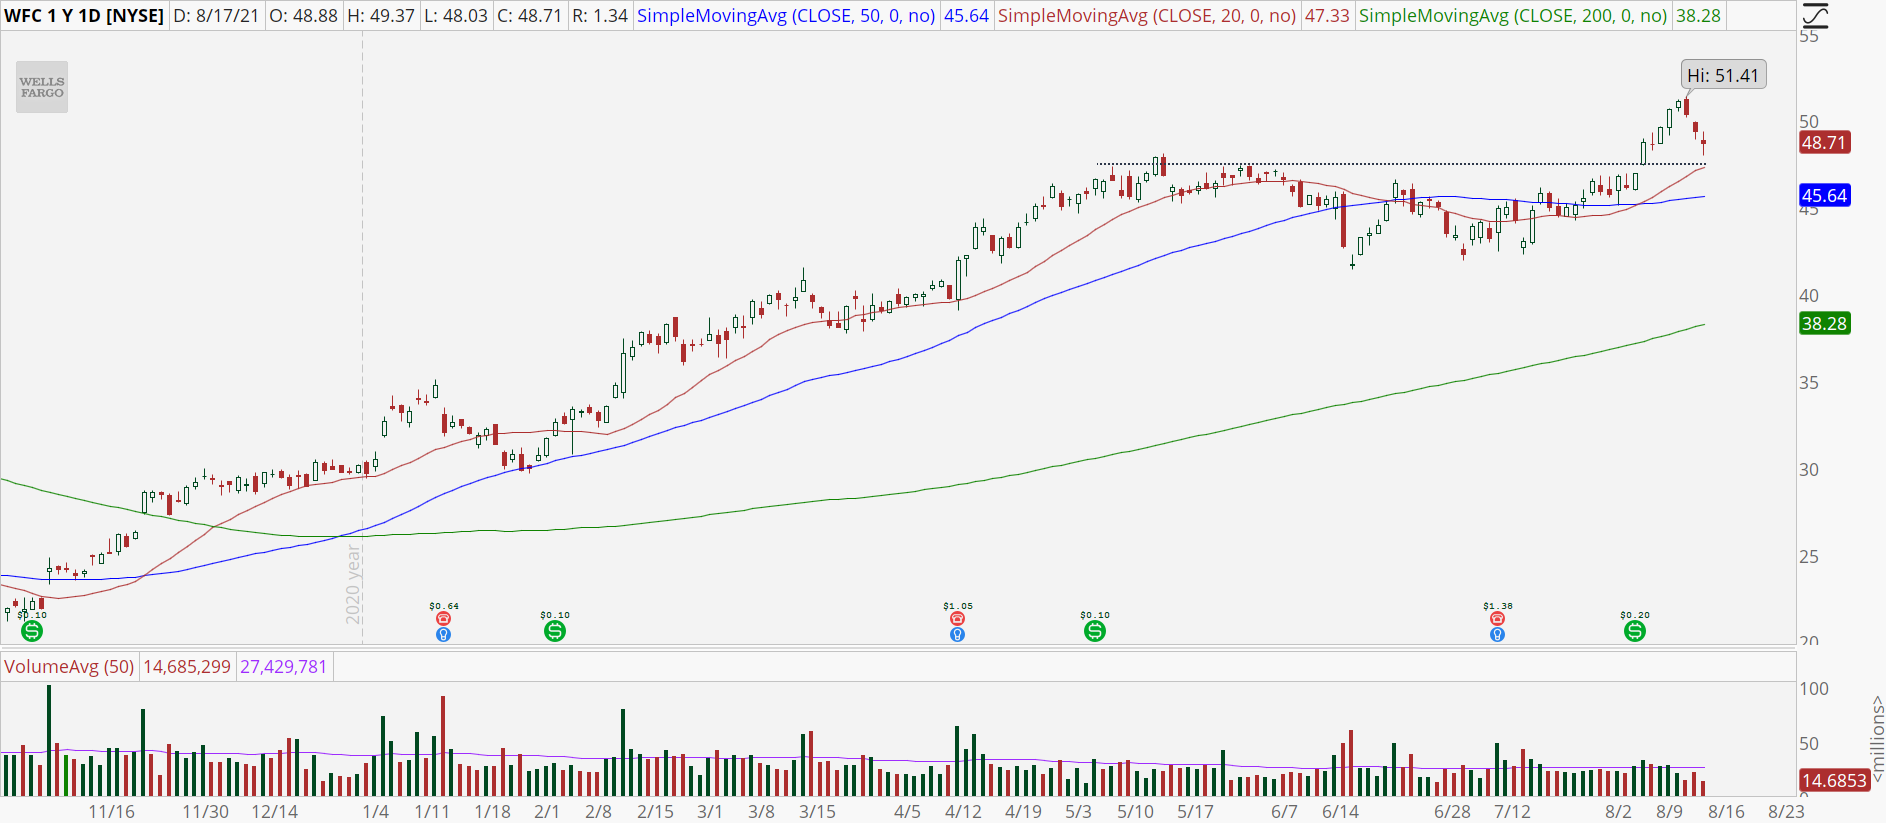 Wells Fargo (WFC) stock chart with bull retracement